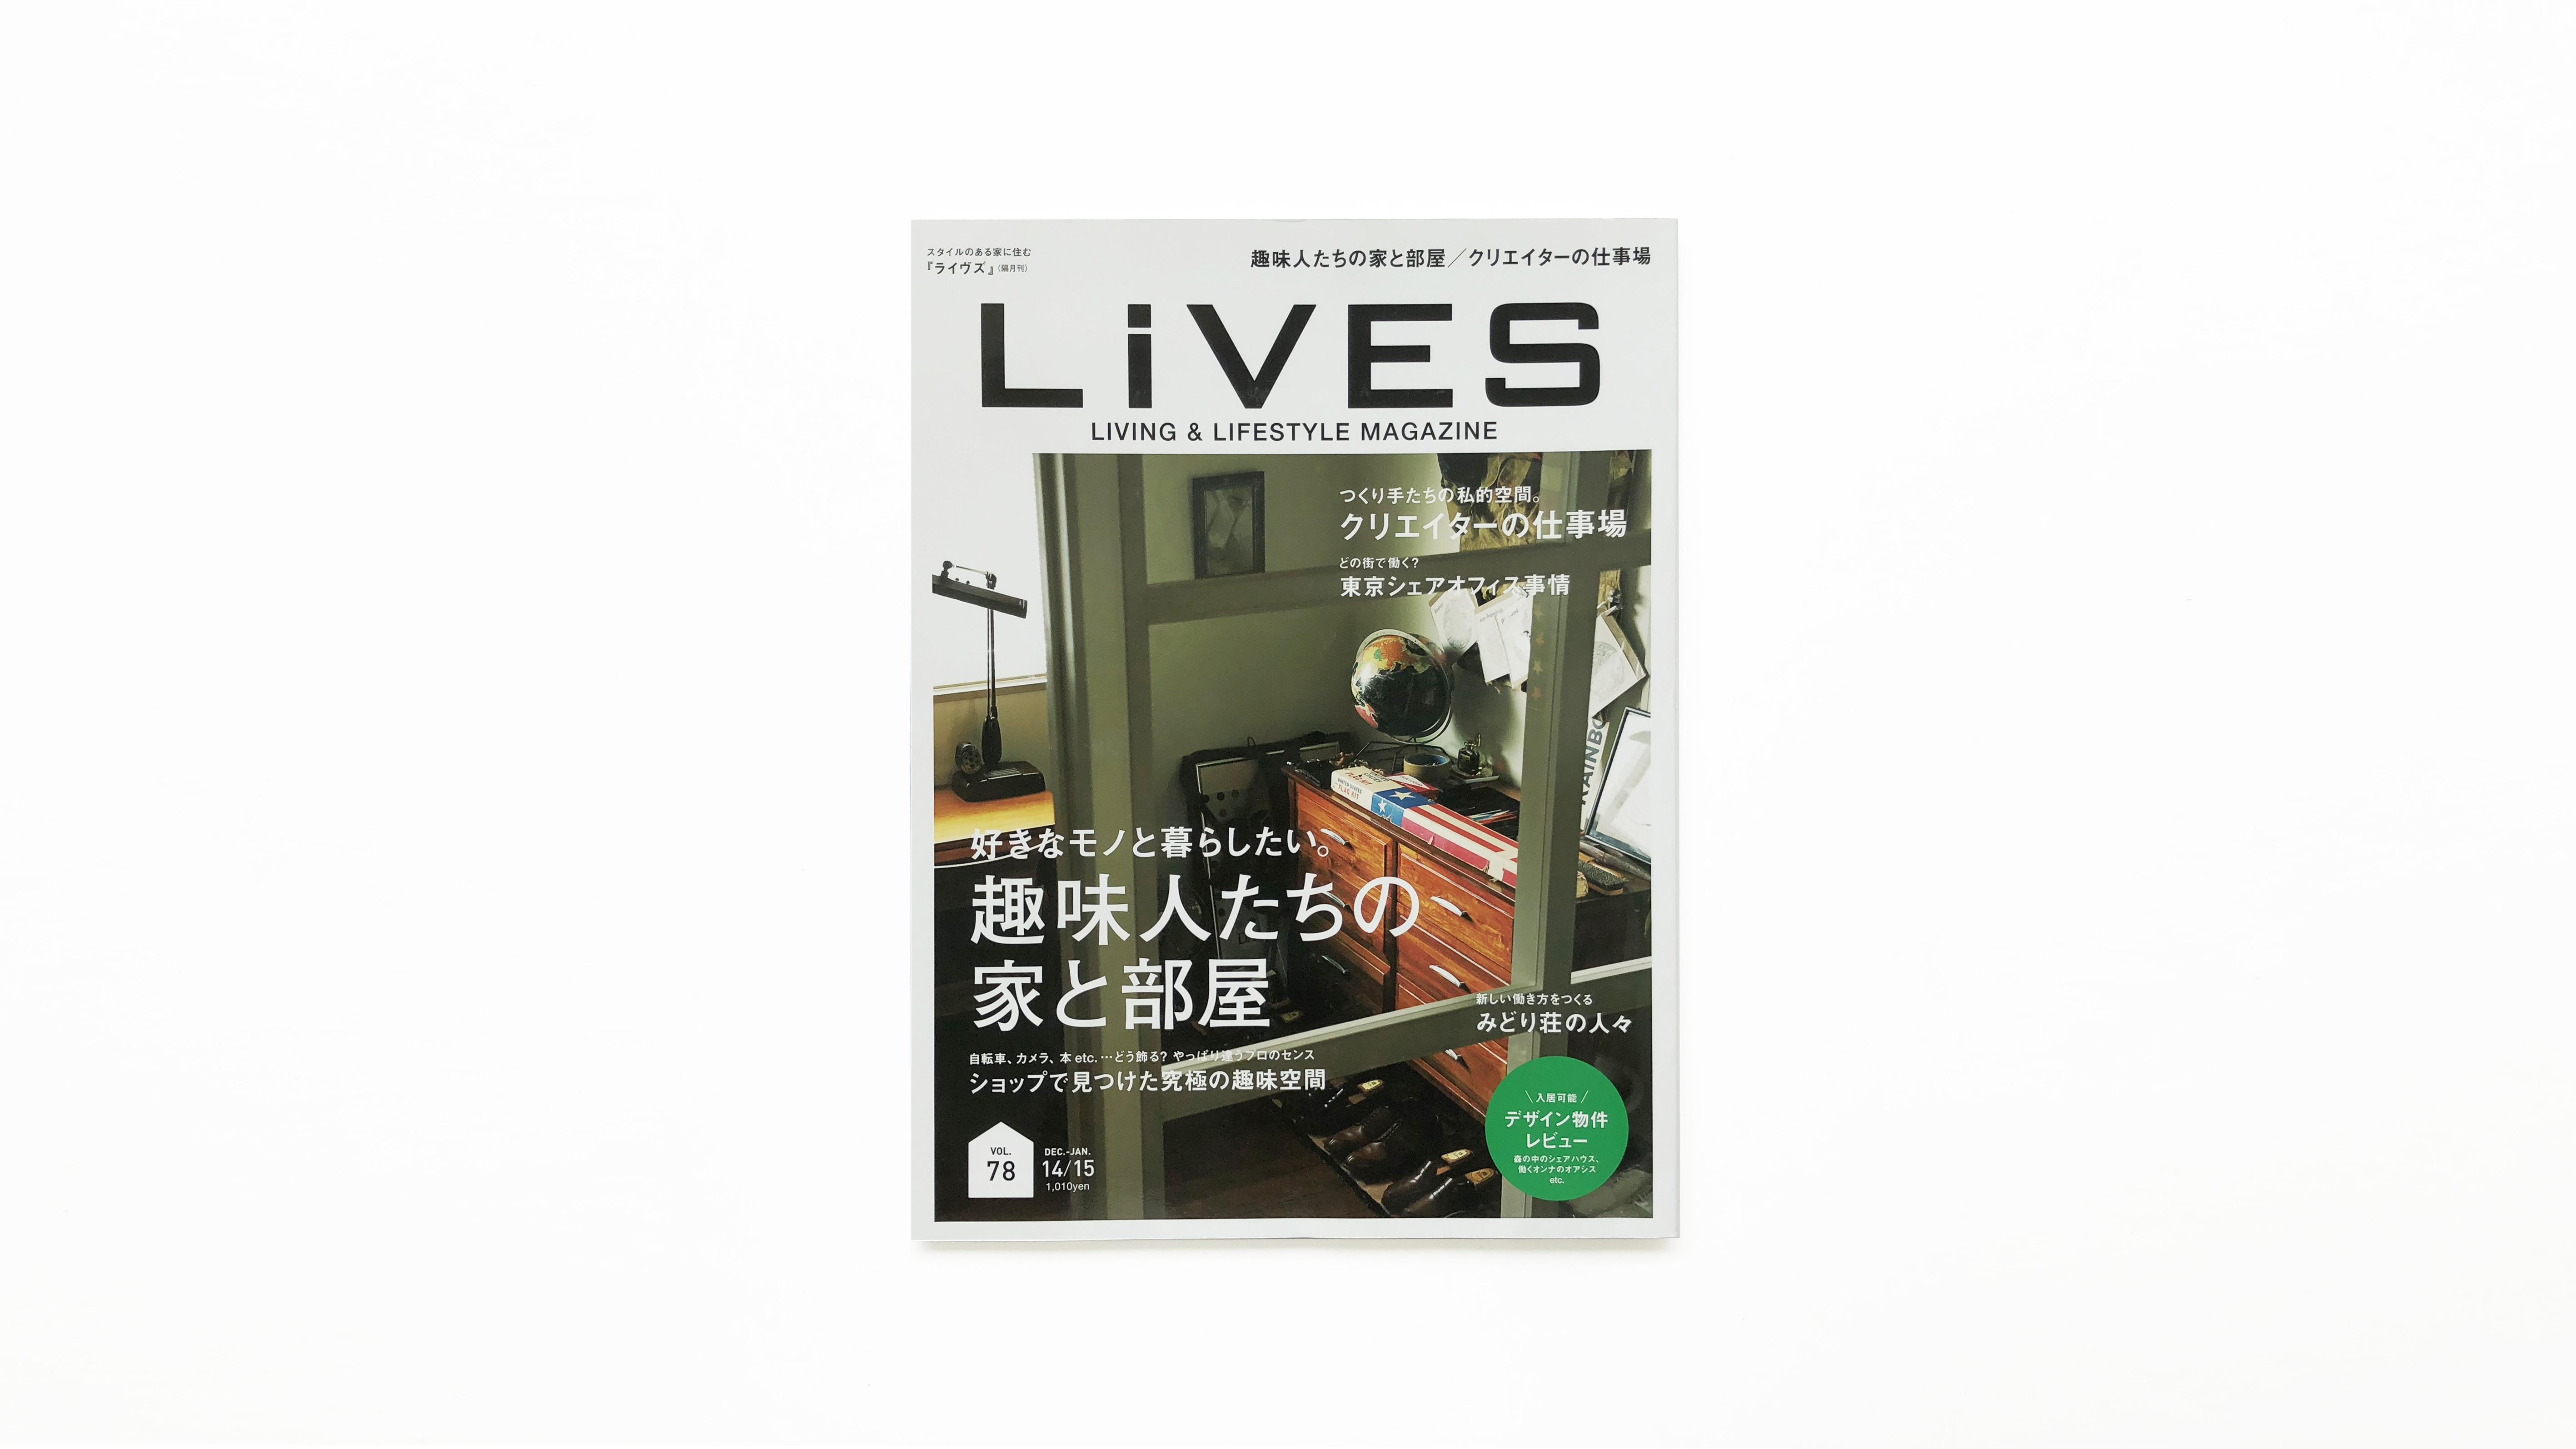 LiVES Vol.74 March / 2014